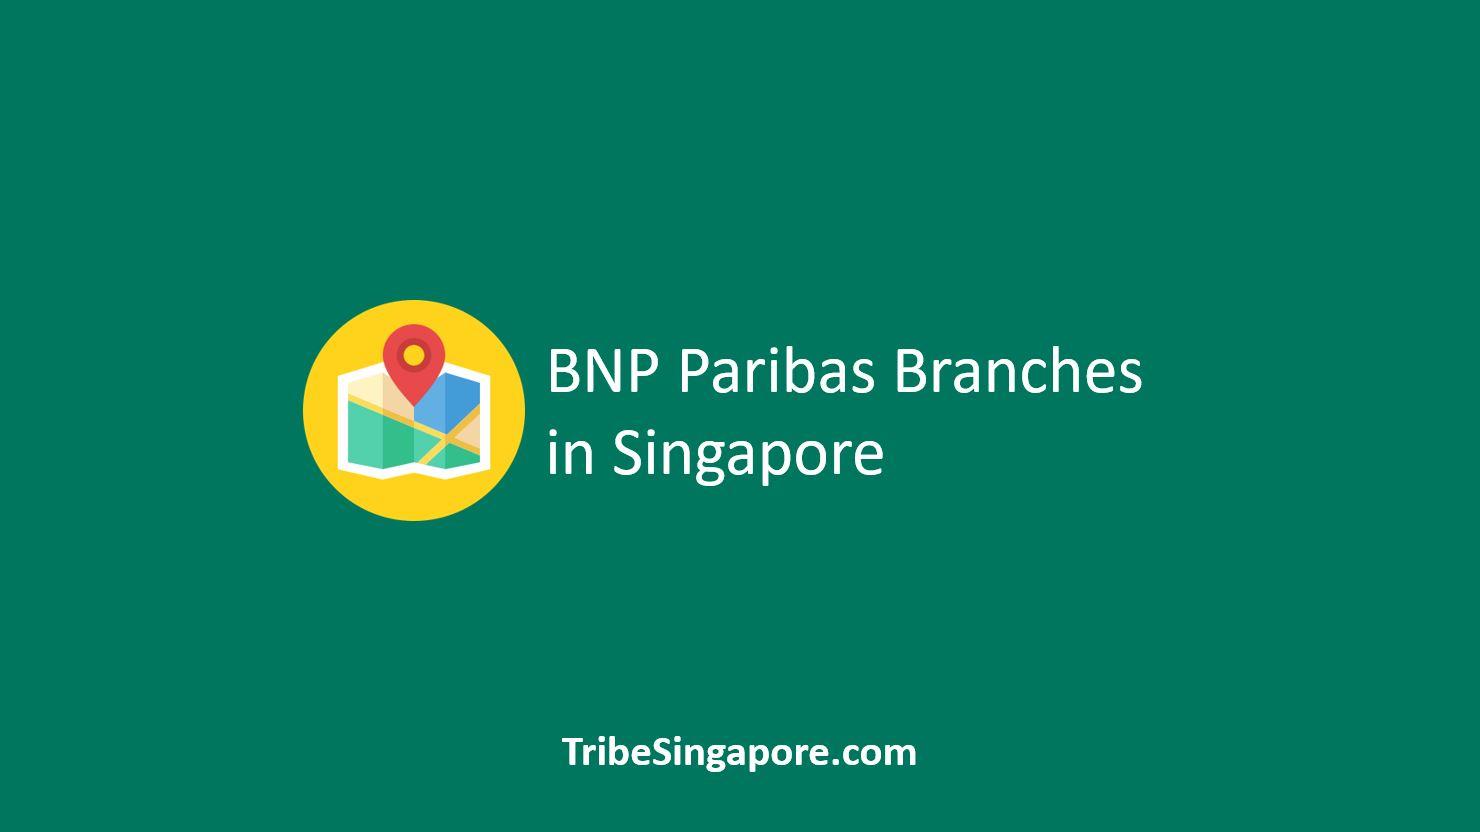 BNP Paribas Branches in Singapore